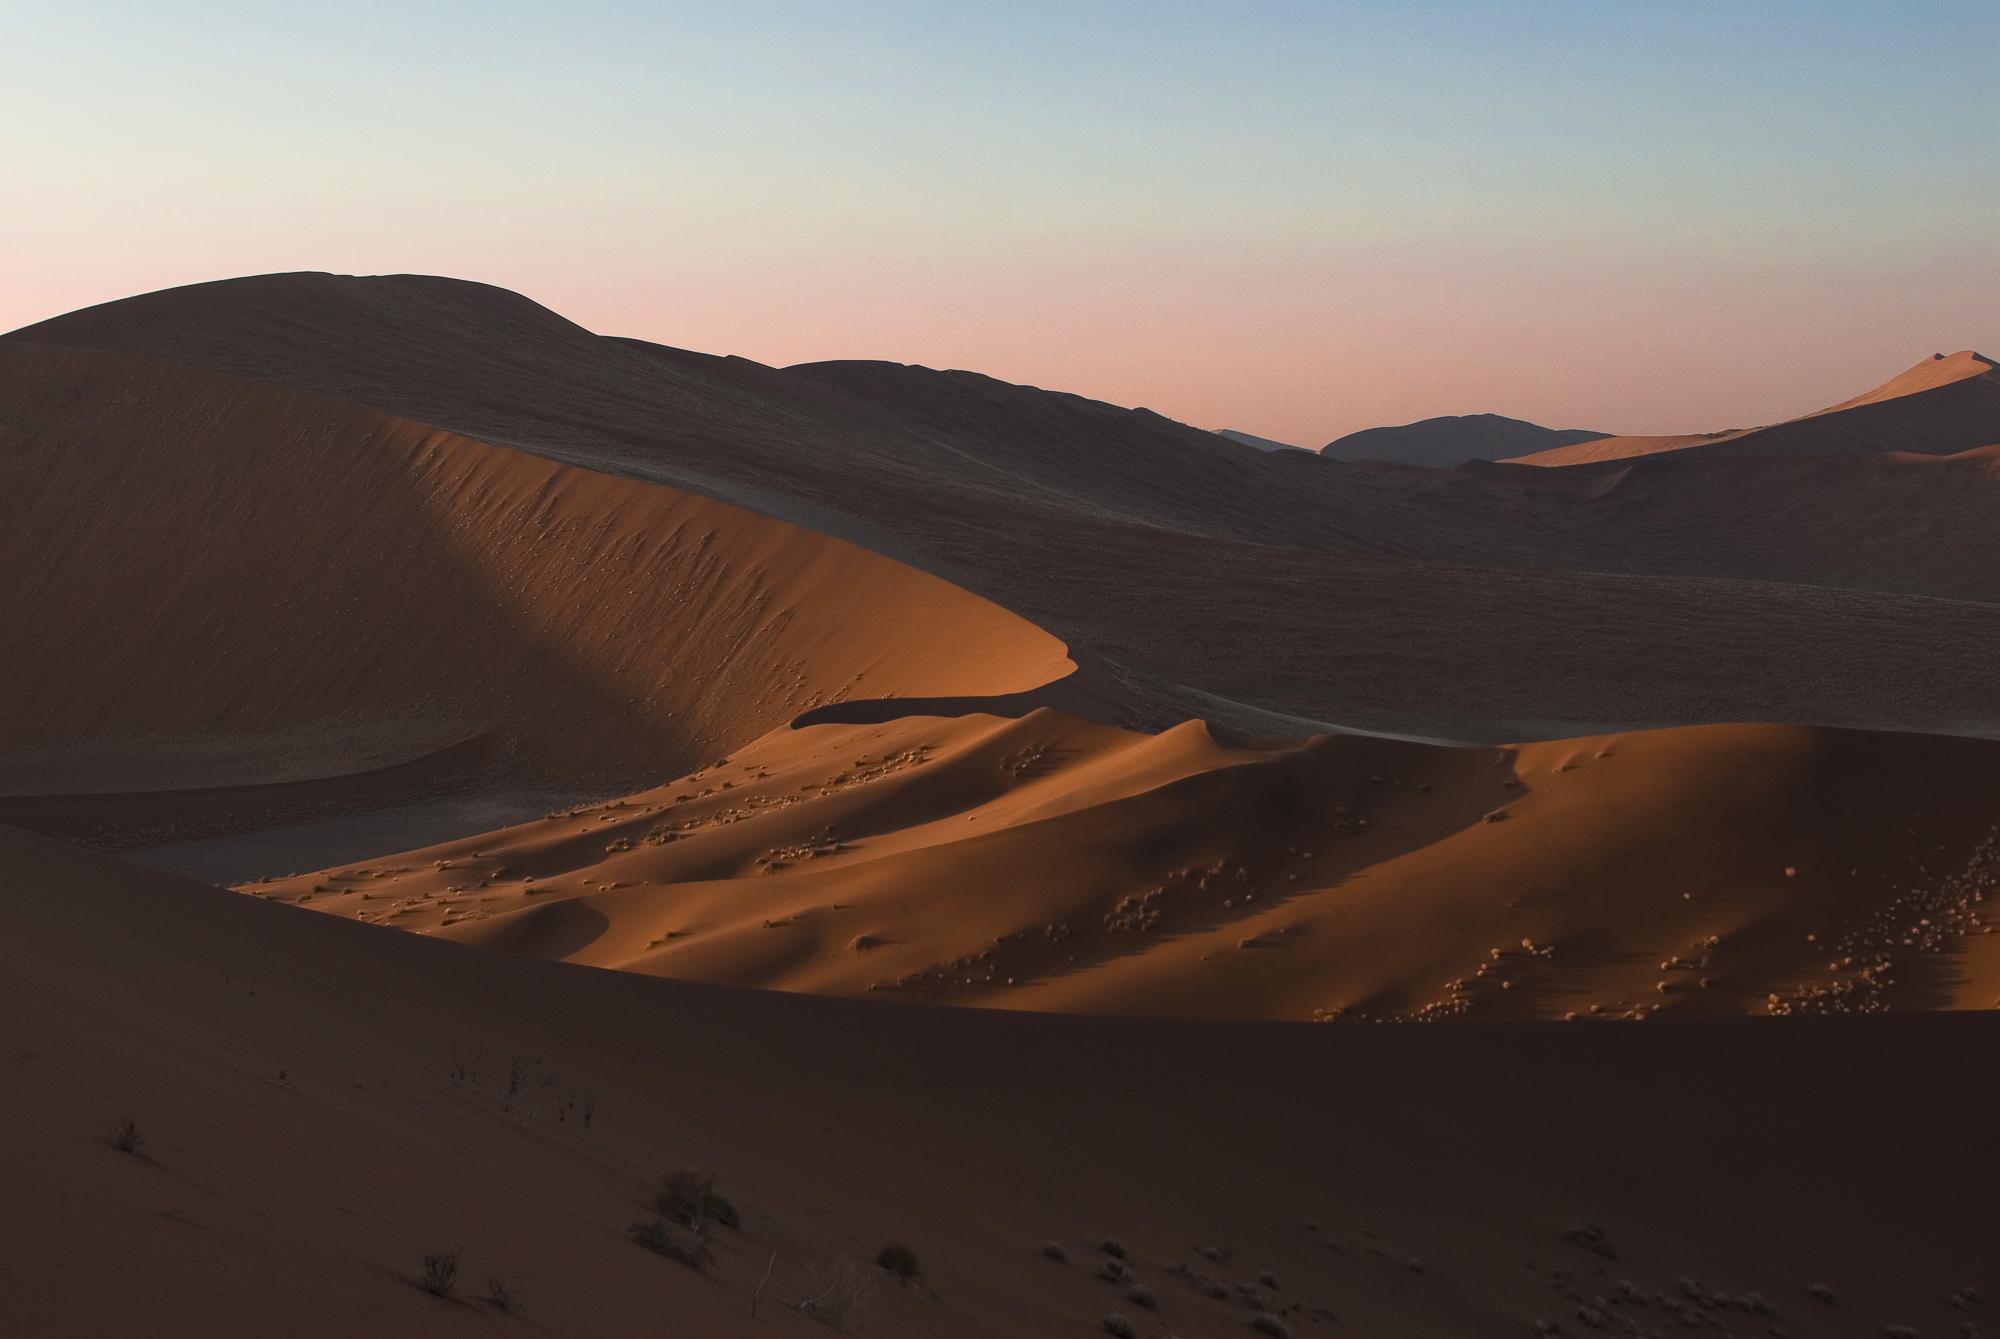 The Namib - Namibia  PHOTOGRAPHY: ALEXANDER J.E. BRADLEY •NIKON D200 • Nikon AF Zoom-Nikkor 35-70mm Ƒ/2.8D @ 35MM • Ƒ/7.1 •1/180 •ISO 100